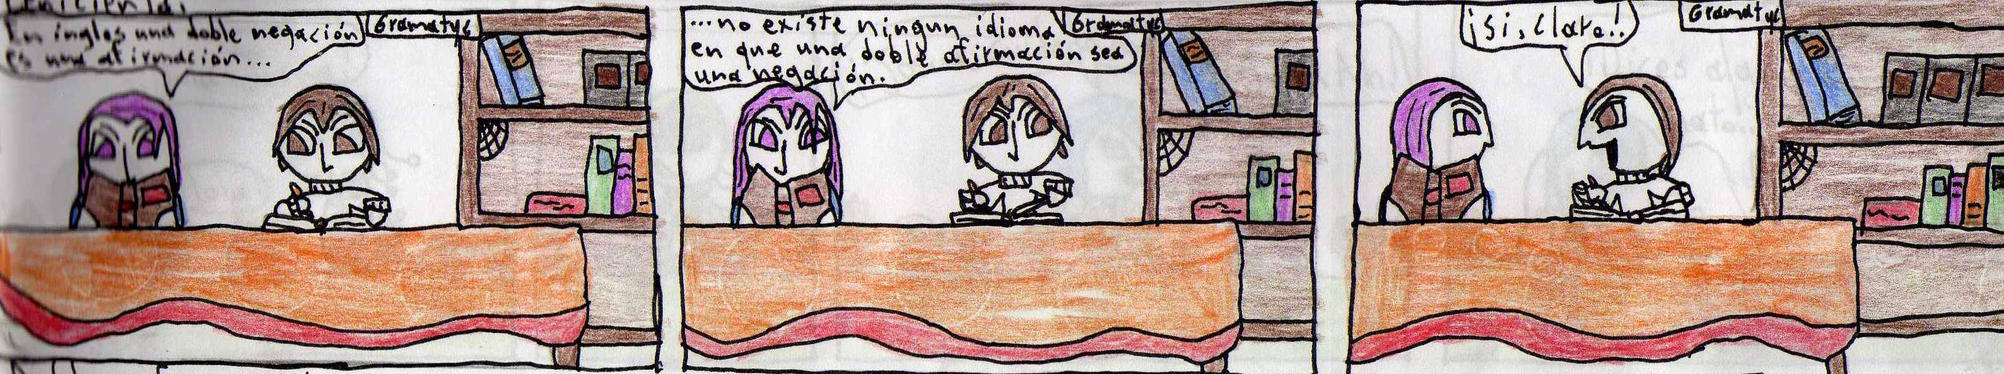 Tiras de Bruma-GTK Doble_afirmacion_by_DamaGT